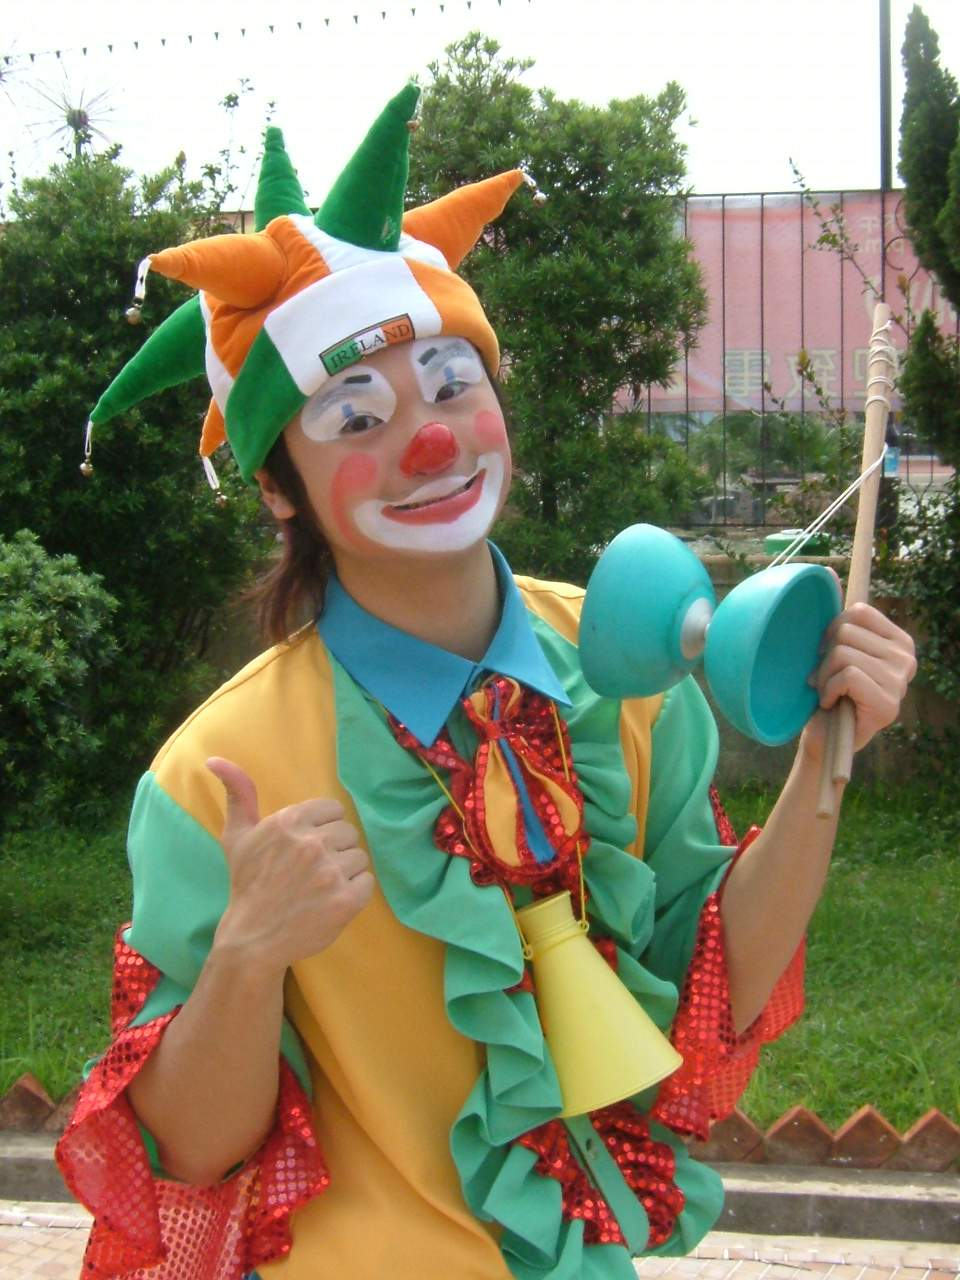 Kenneth NG: clowns stiltwalkers stiltwalker clowns stilt performers hong kong 生日會派對、小丑、扭汽球、雜耍雜技武術、舞蹈  遊戲, 小丑扭汽球、雜耍雜技